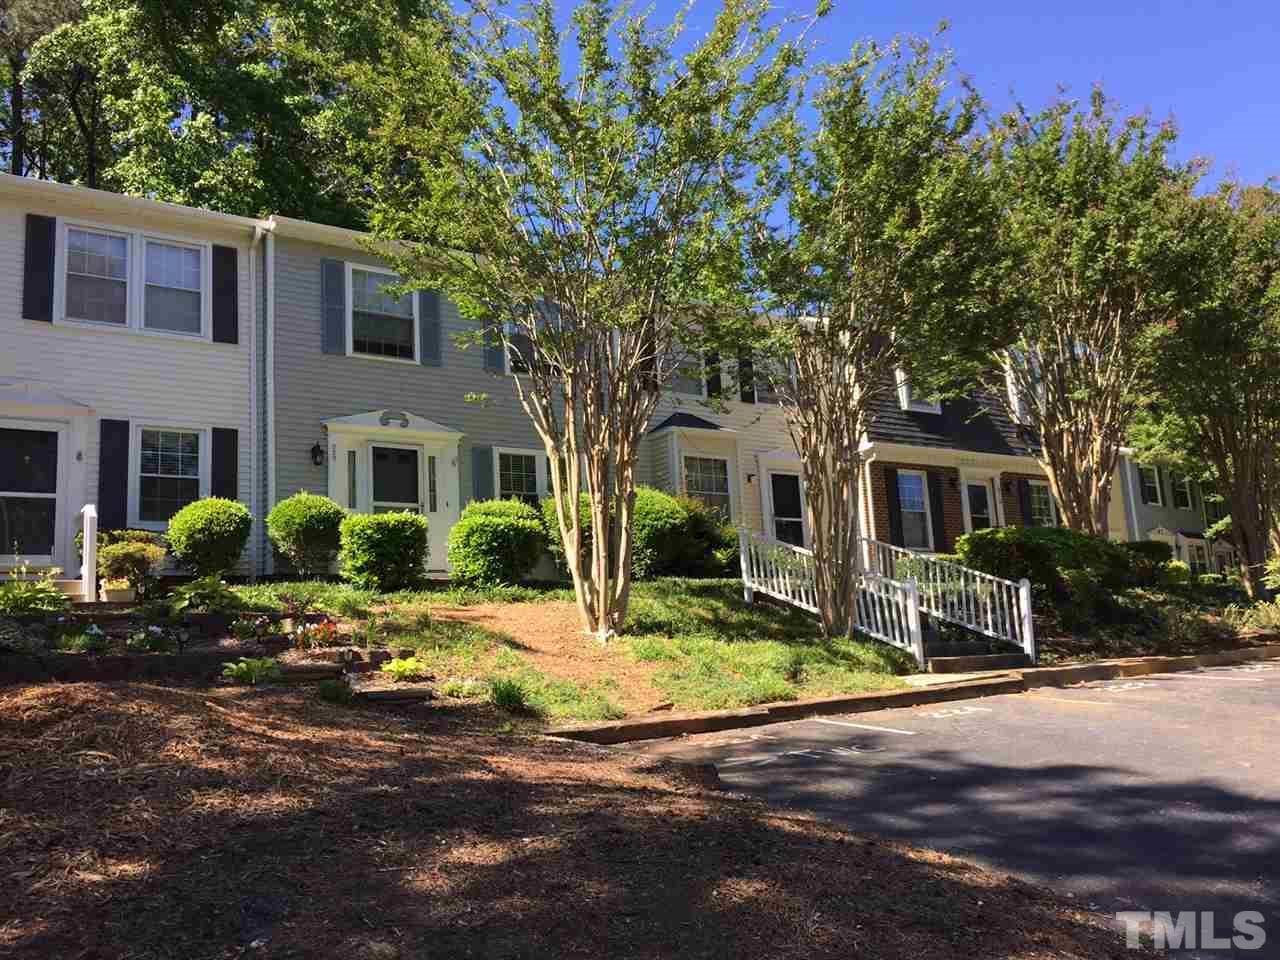 222 Rosebrooks Drive, Cary, NC 27513